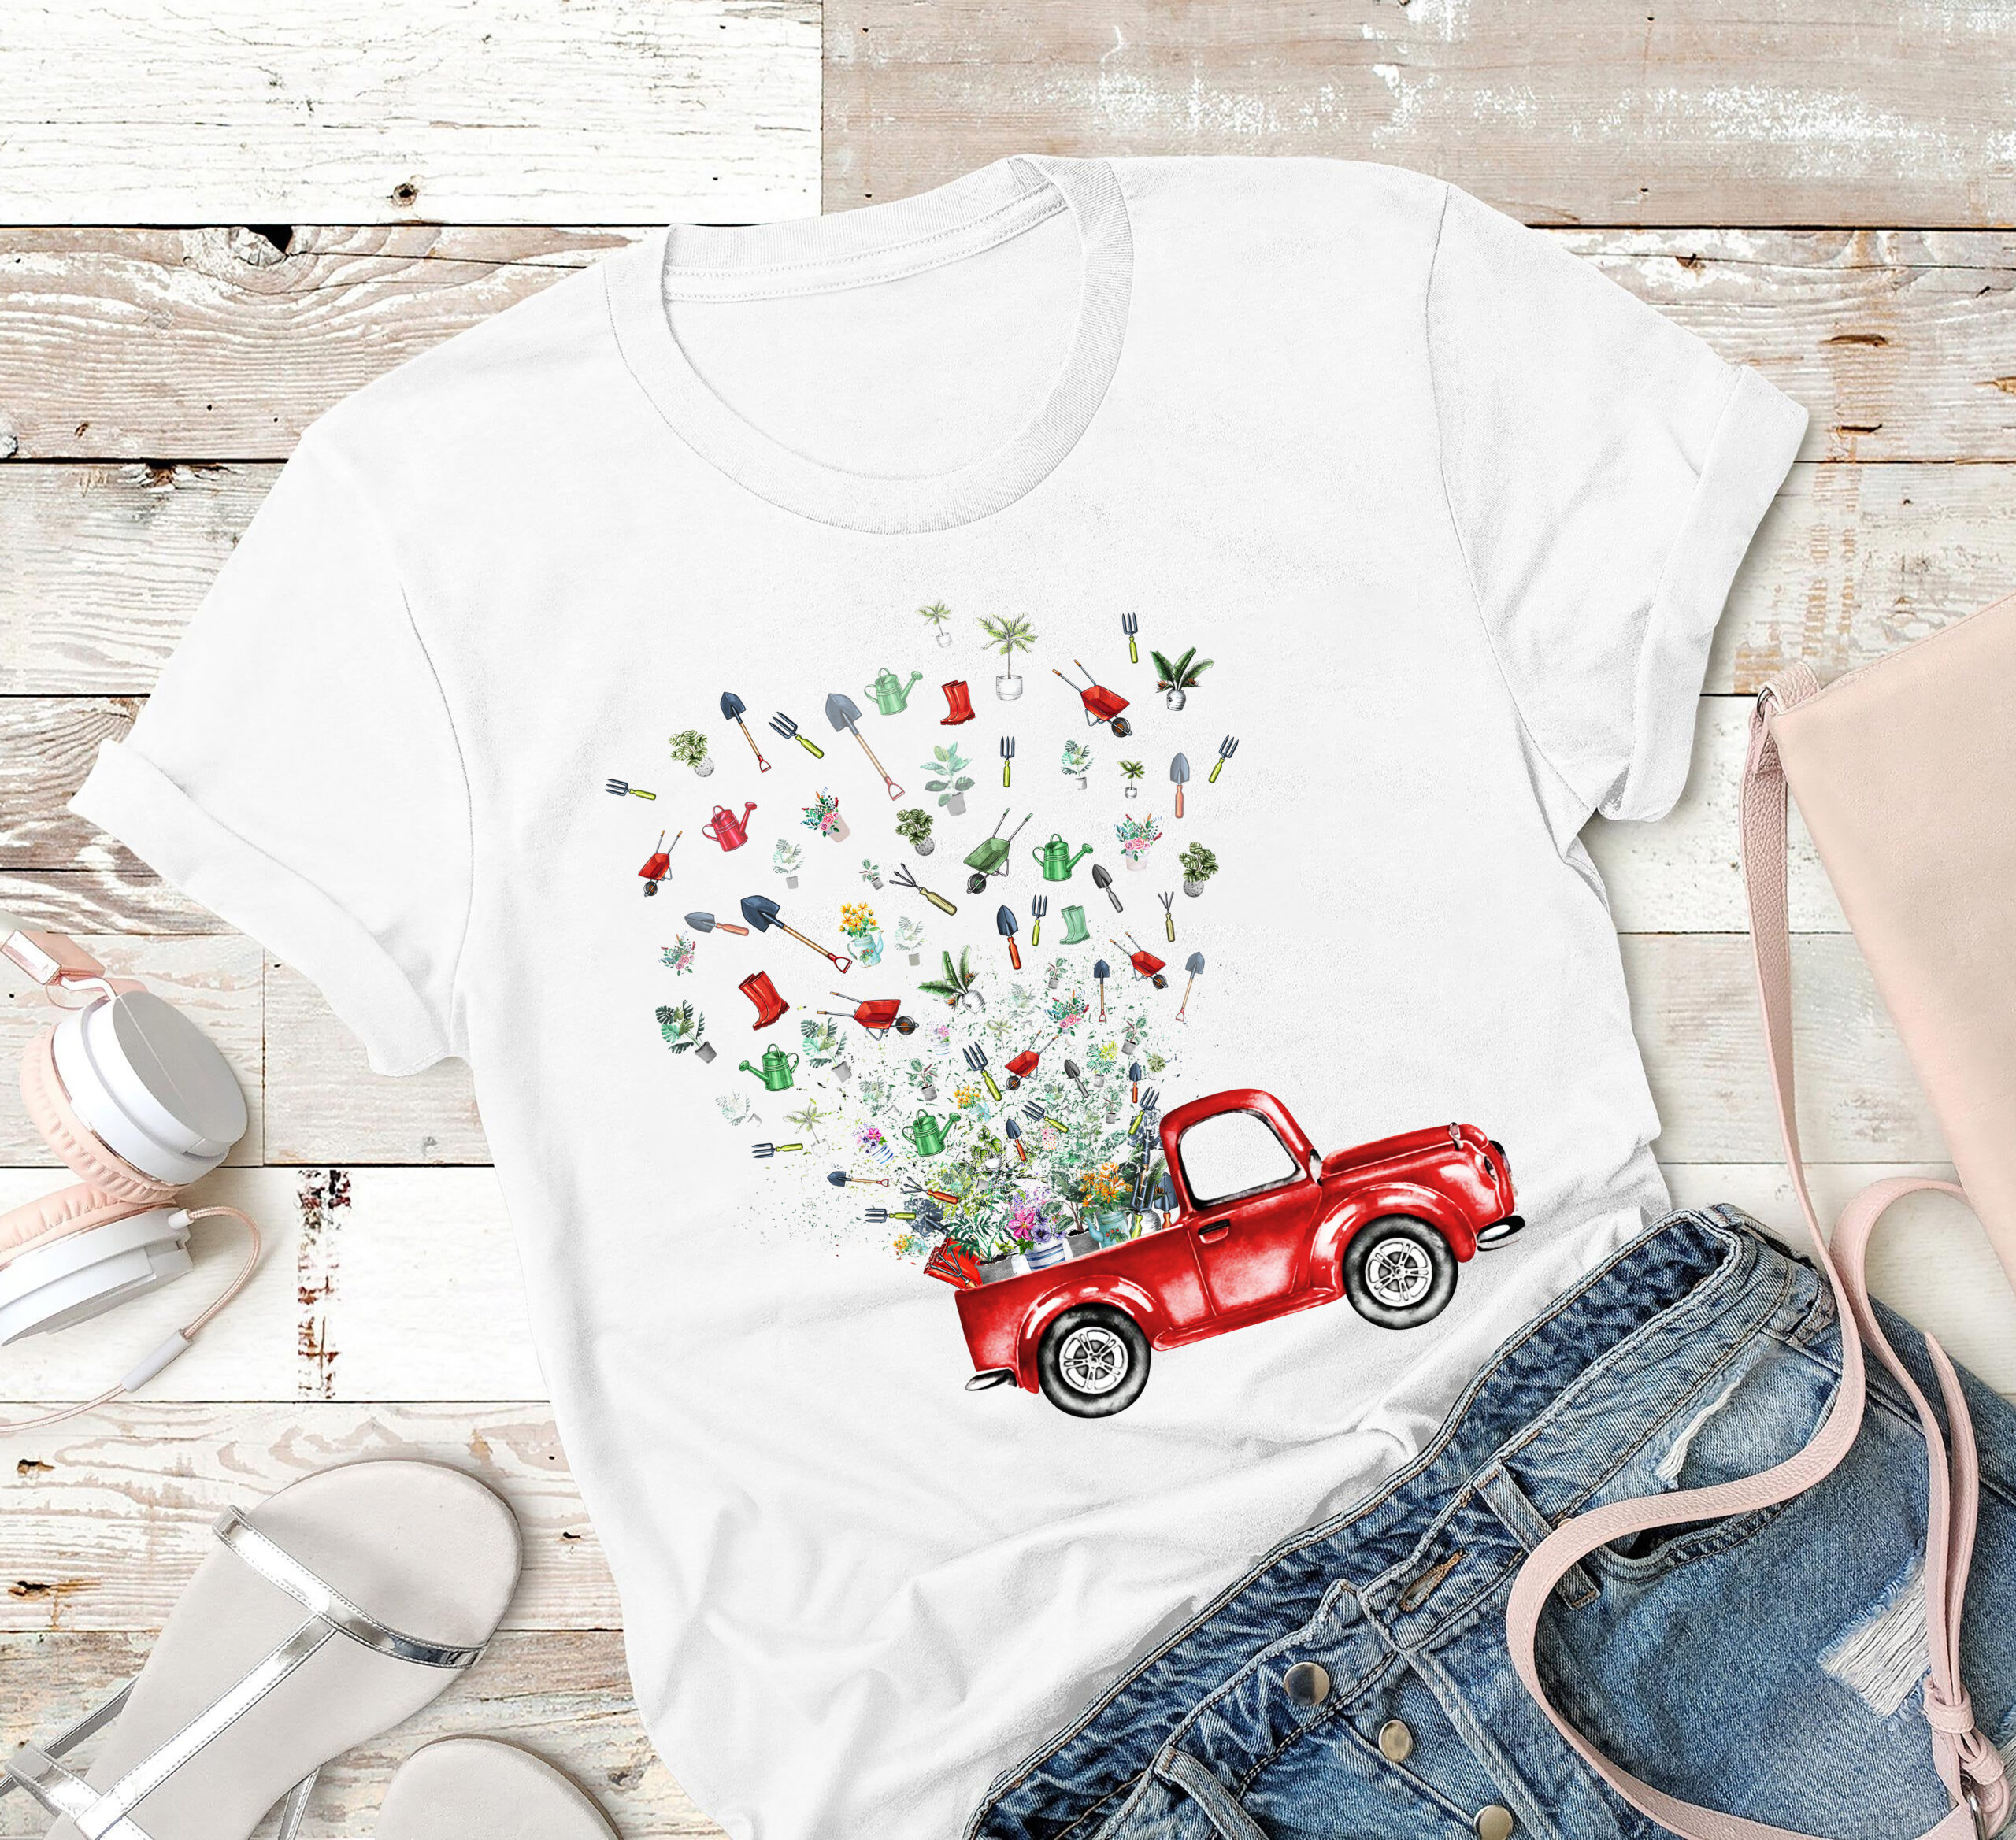 Garden Shirt Truck Gardening Tools Fly